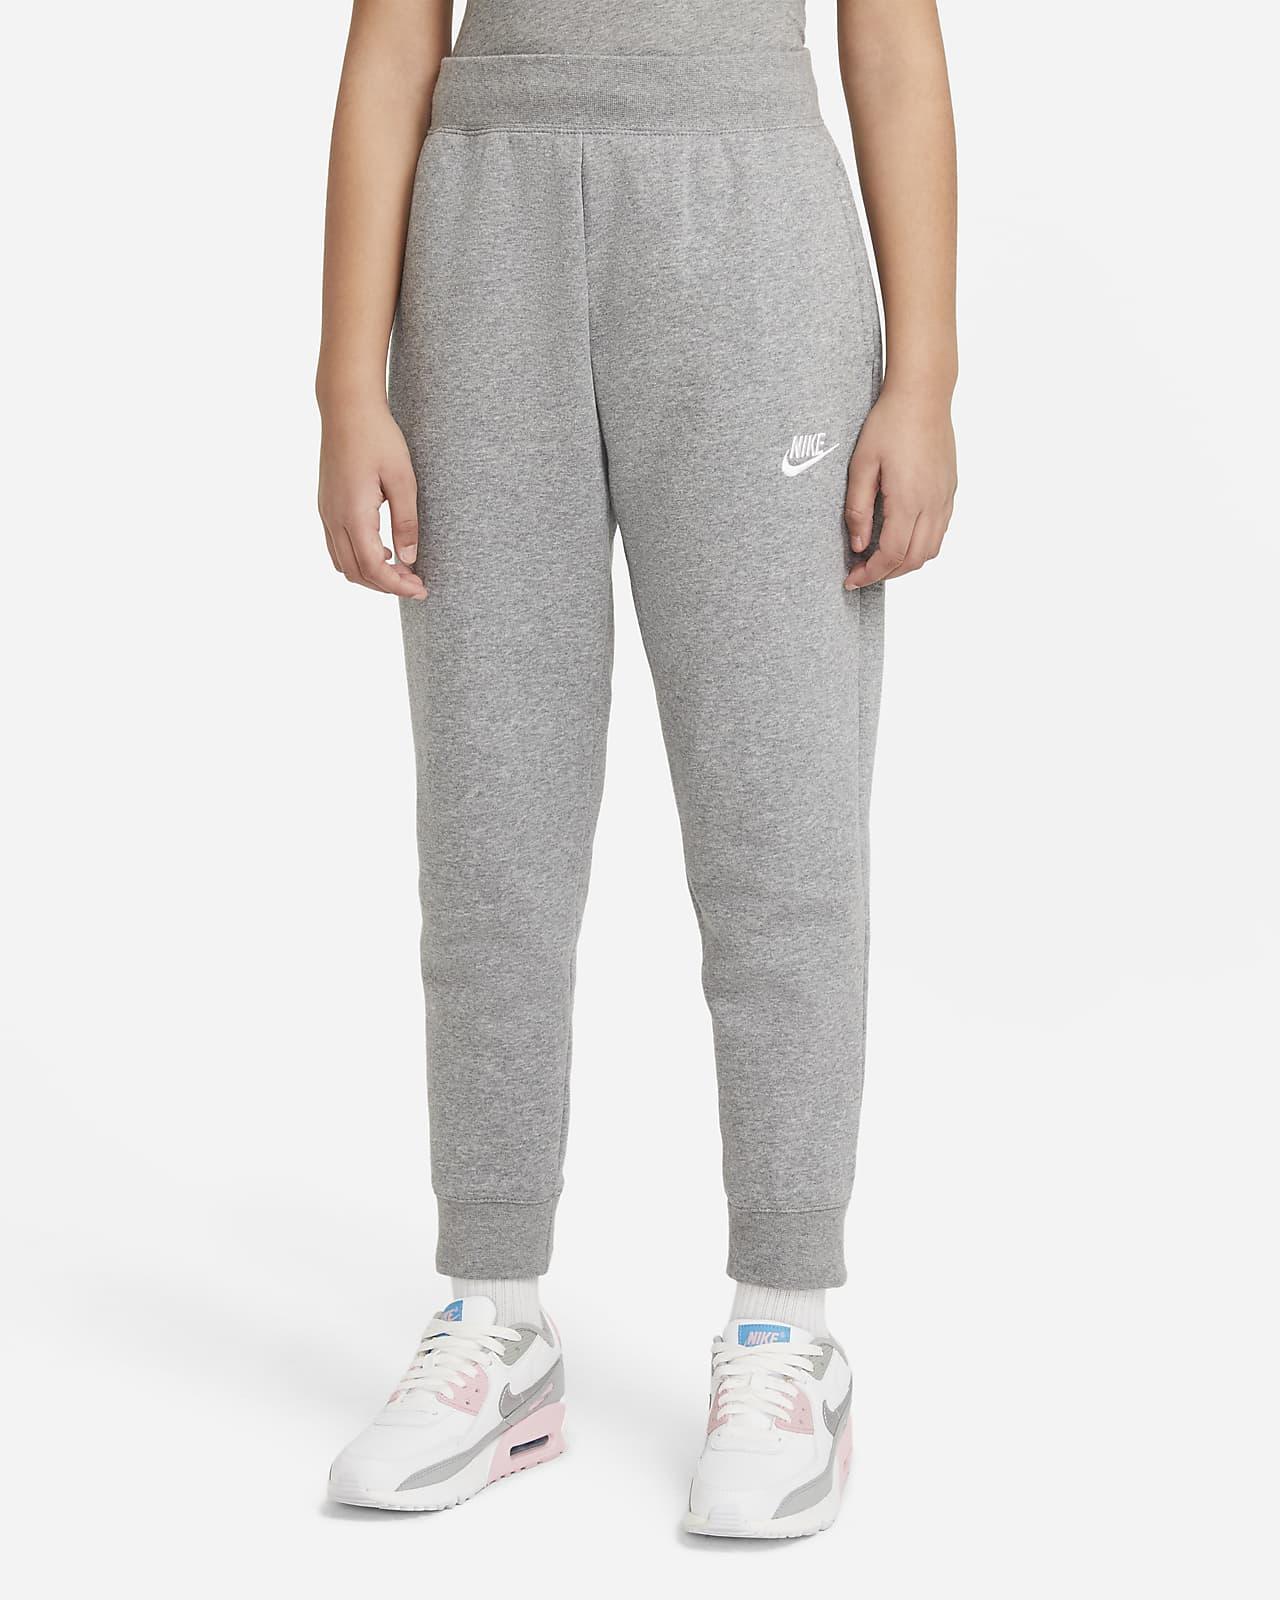 Calças Nike Sportswear Club Fleece Júnior (Rapariga)